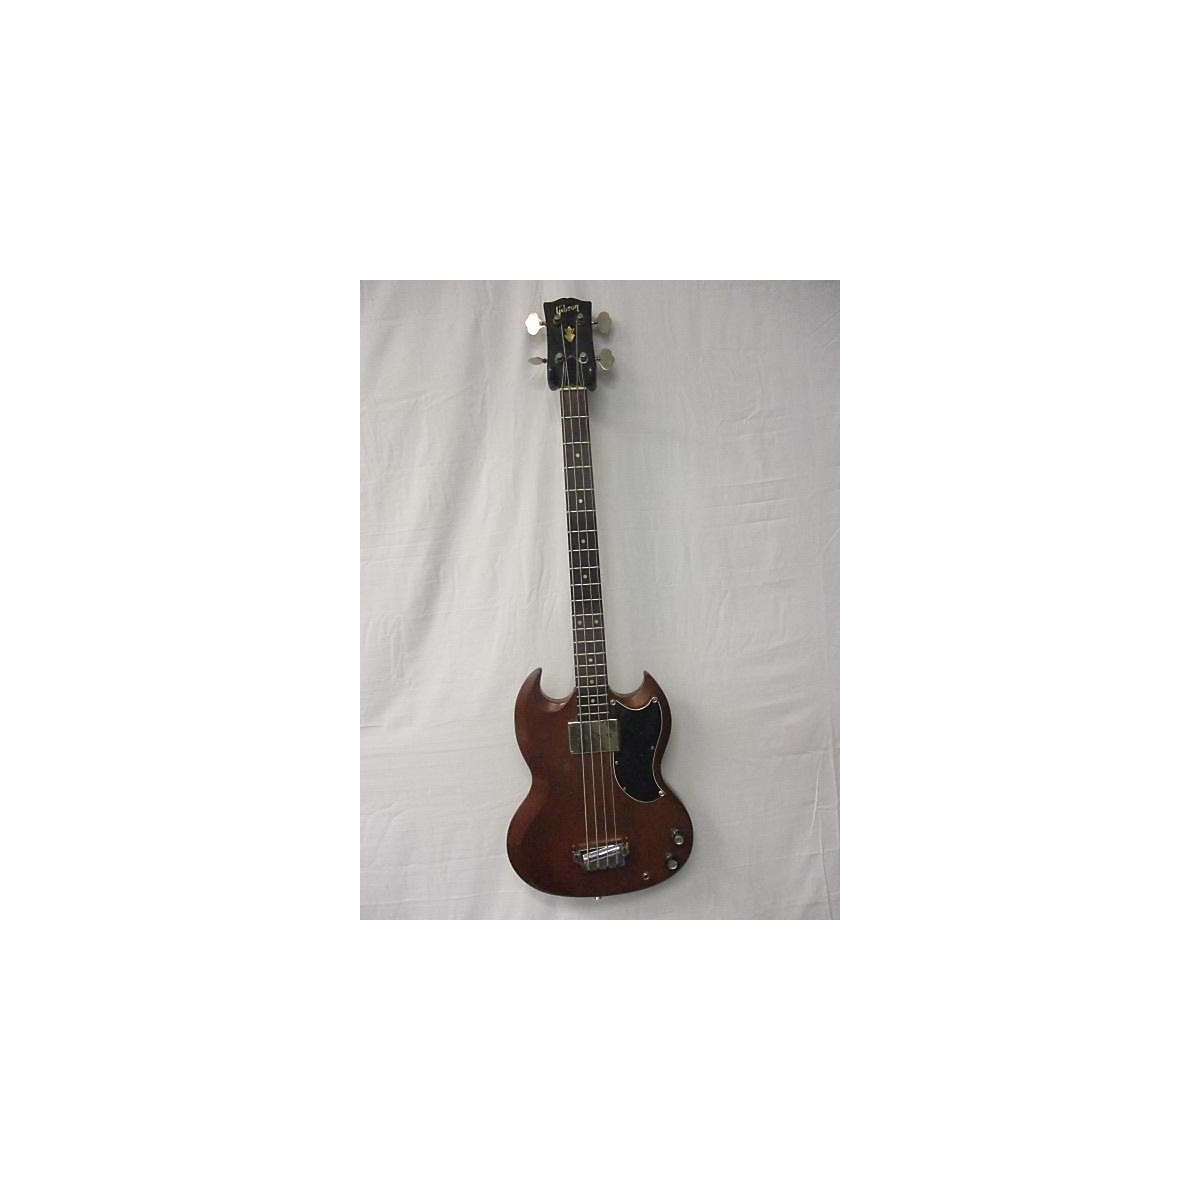 Gibson 1964 EB0 Electric Bass Guitar